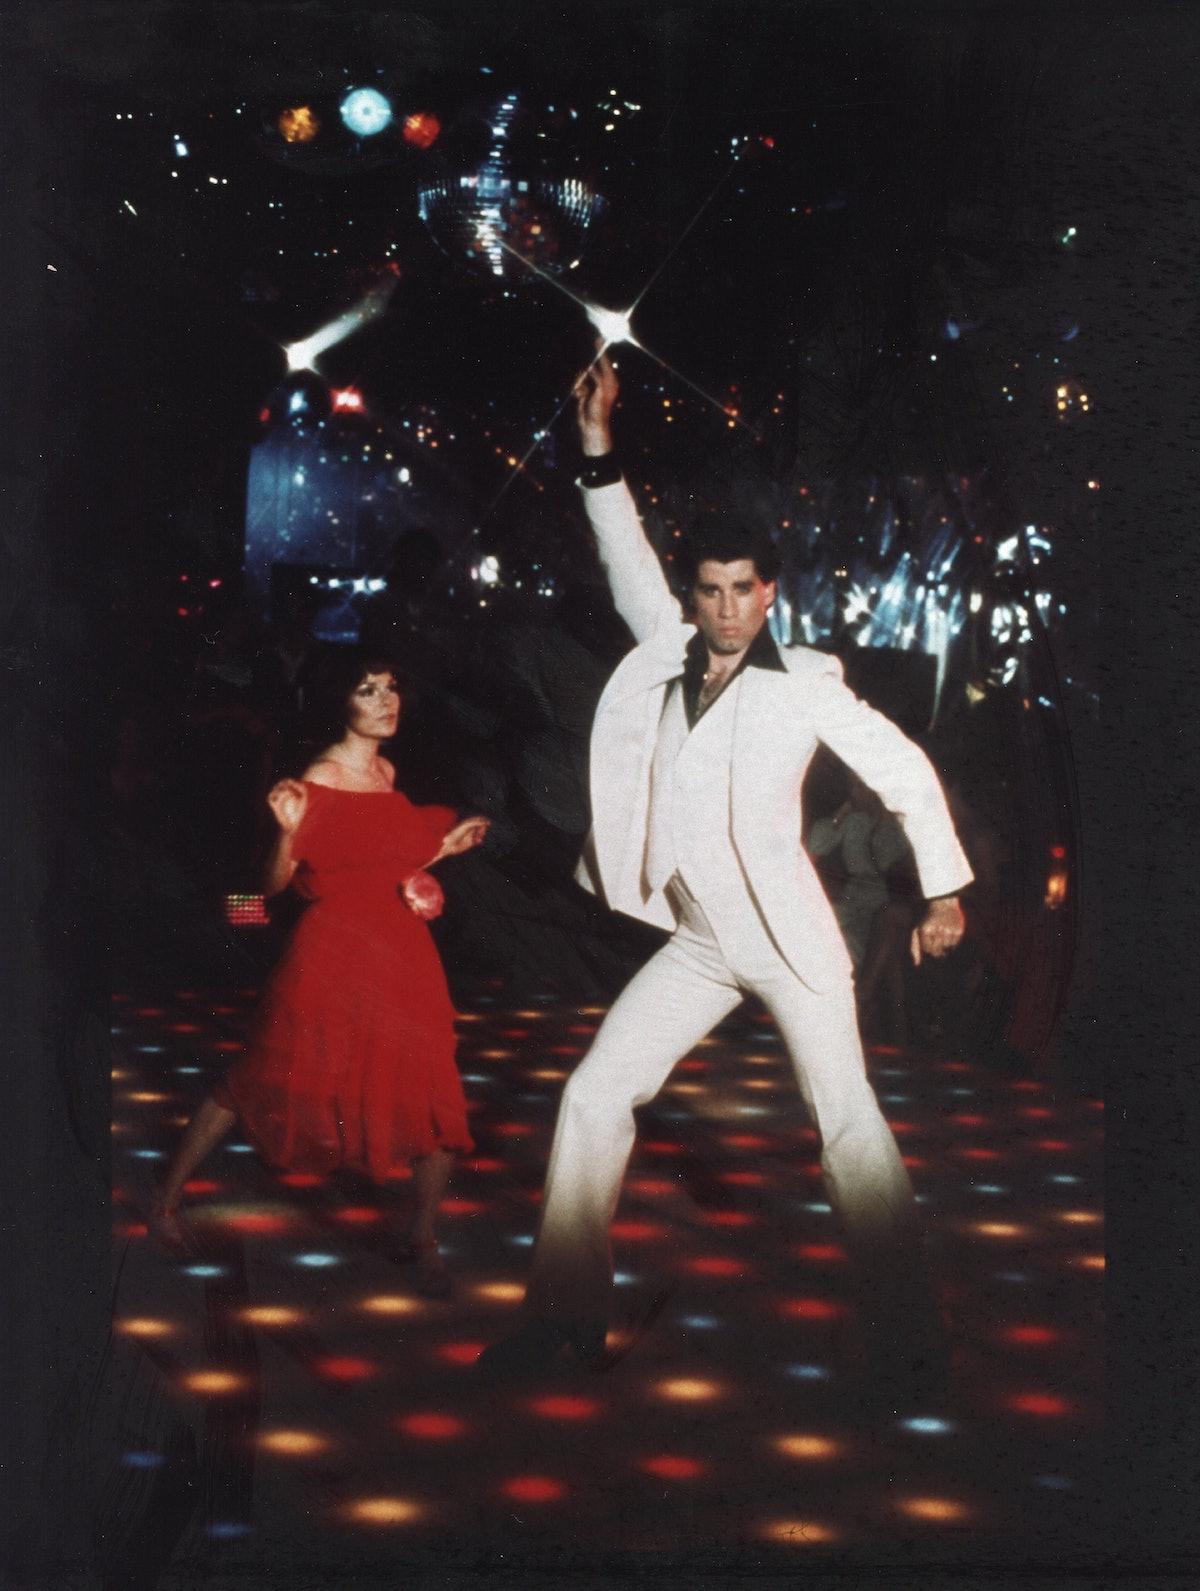 John Travolta in Saturday Night Fever, 1977.